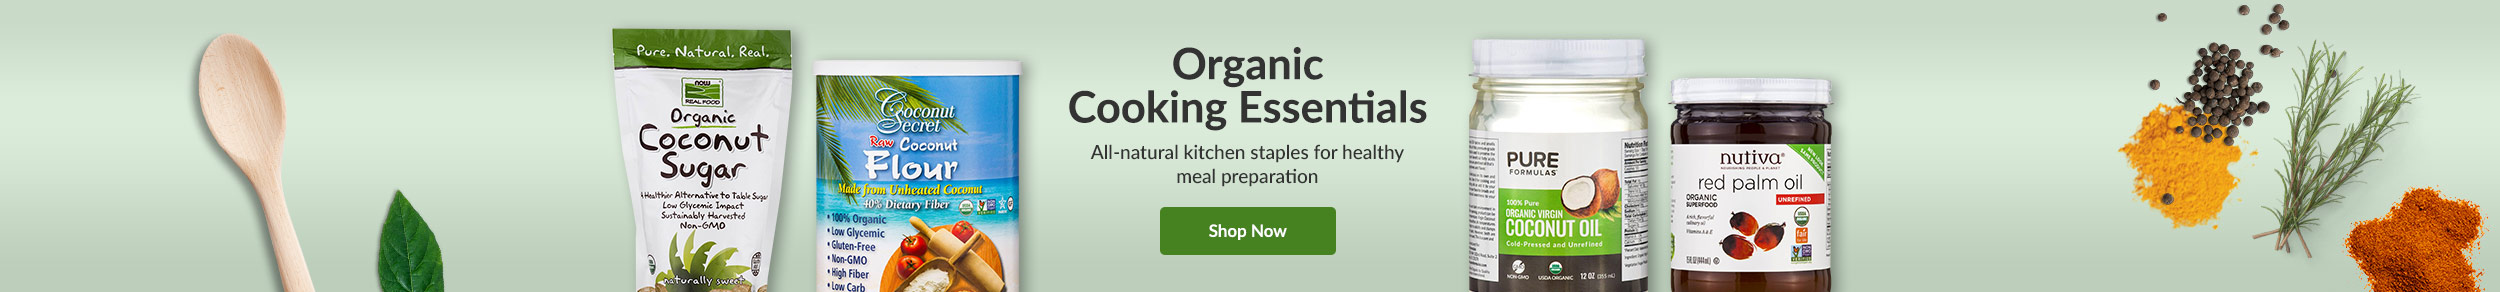 https://i3.pureformulas.net/images/static/Organic-Cooking-Essentials_slide3_062818.jpg